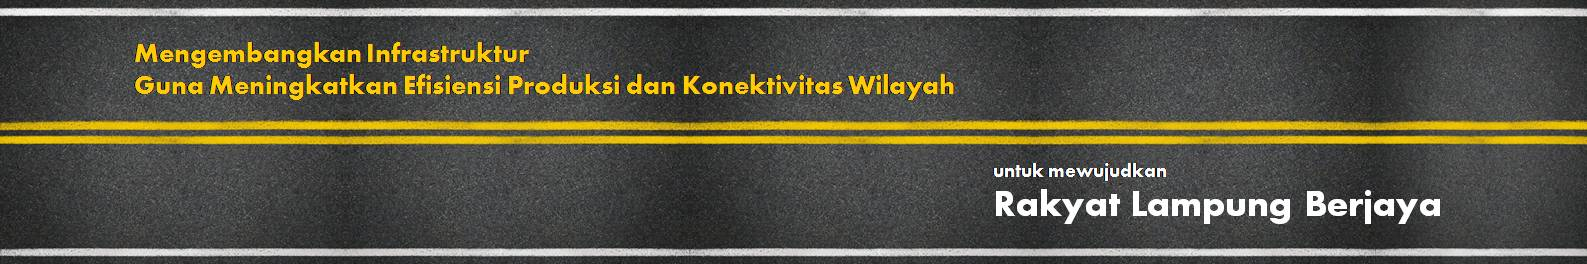 Banner visi misi bmbk